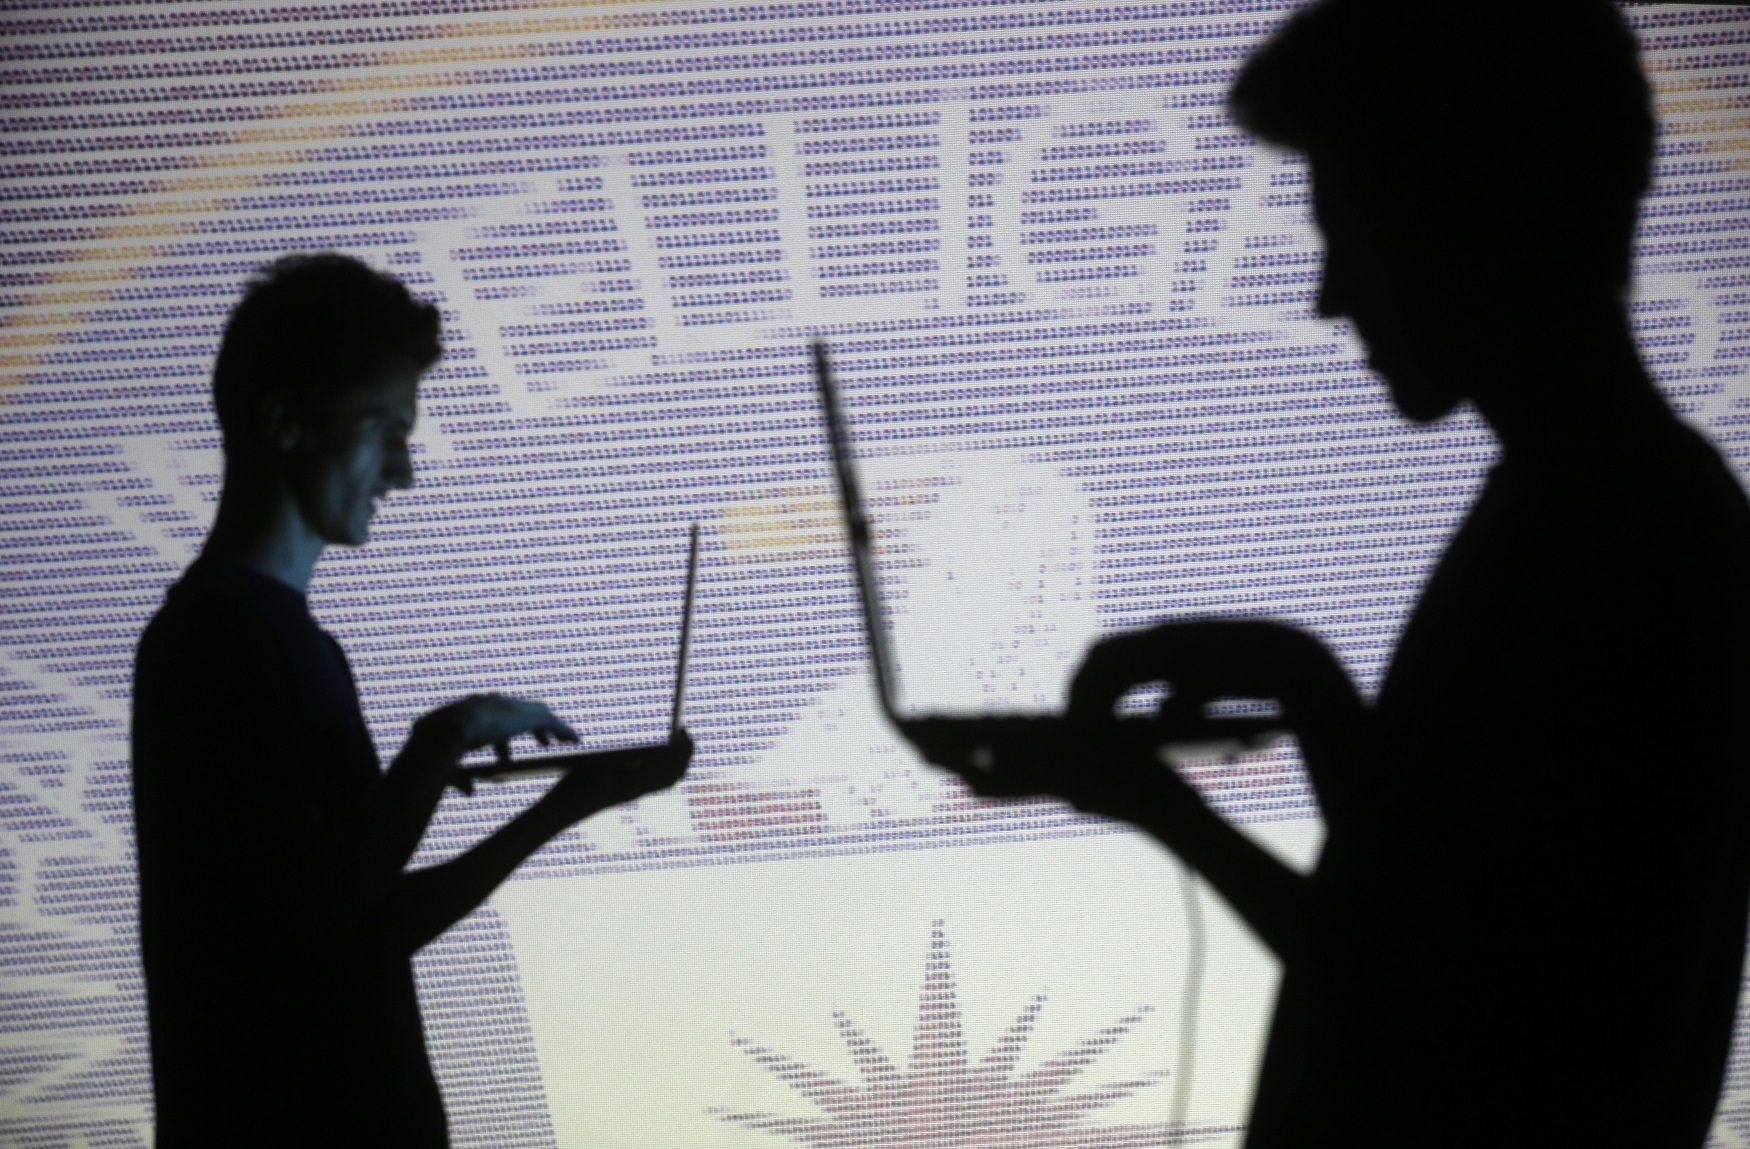 cia spying wikileaks vault 7